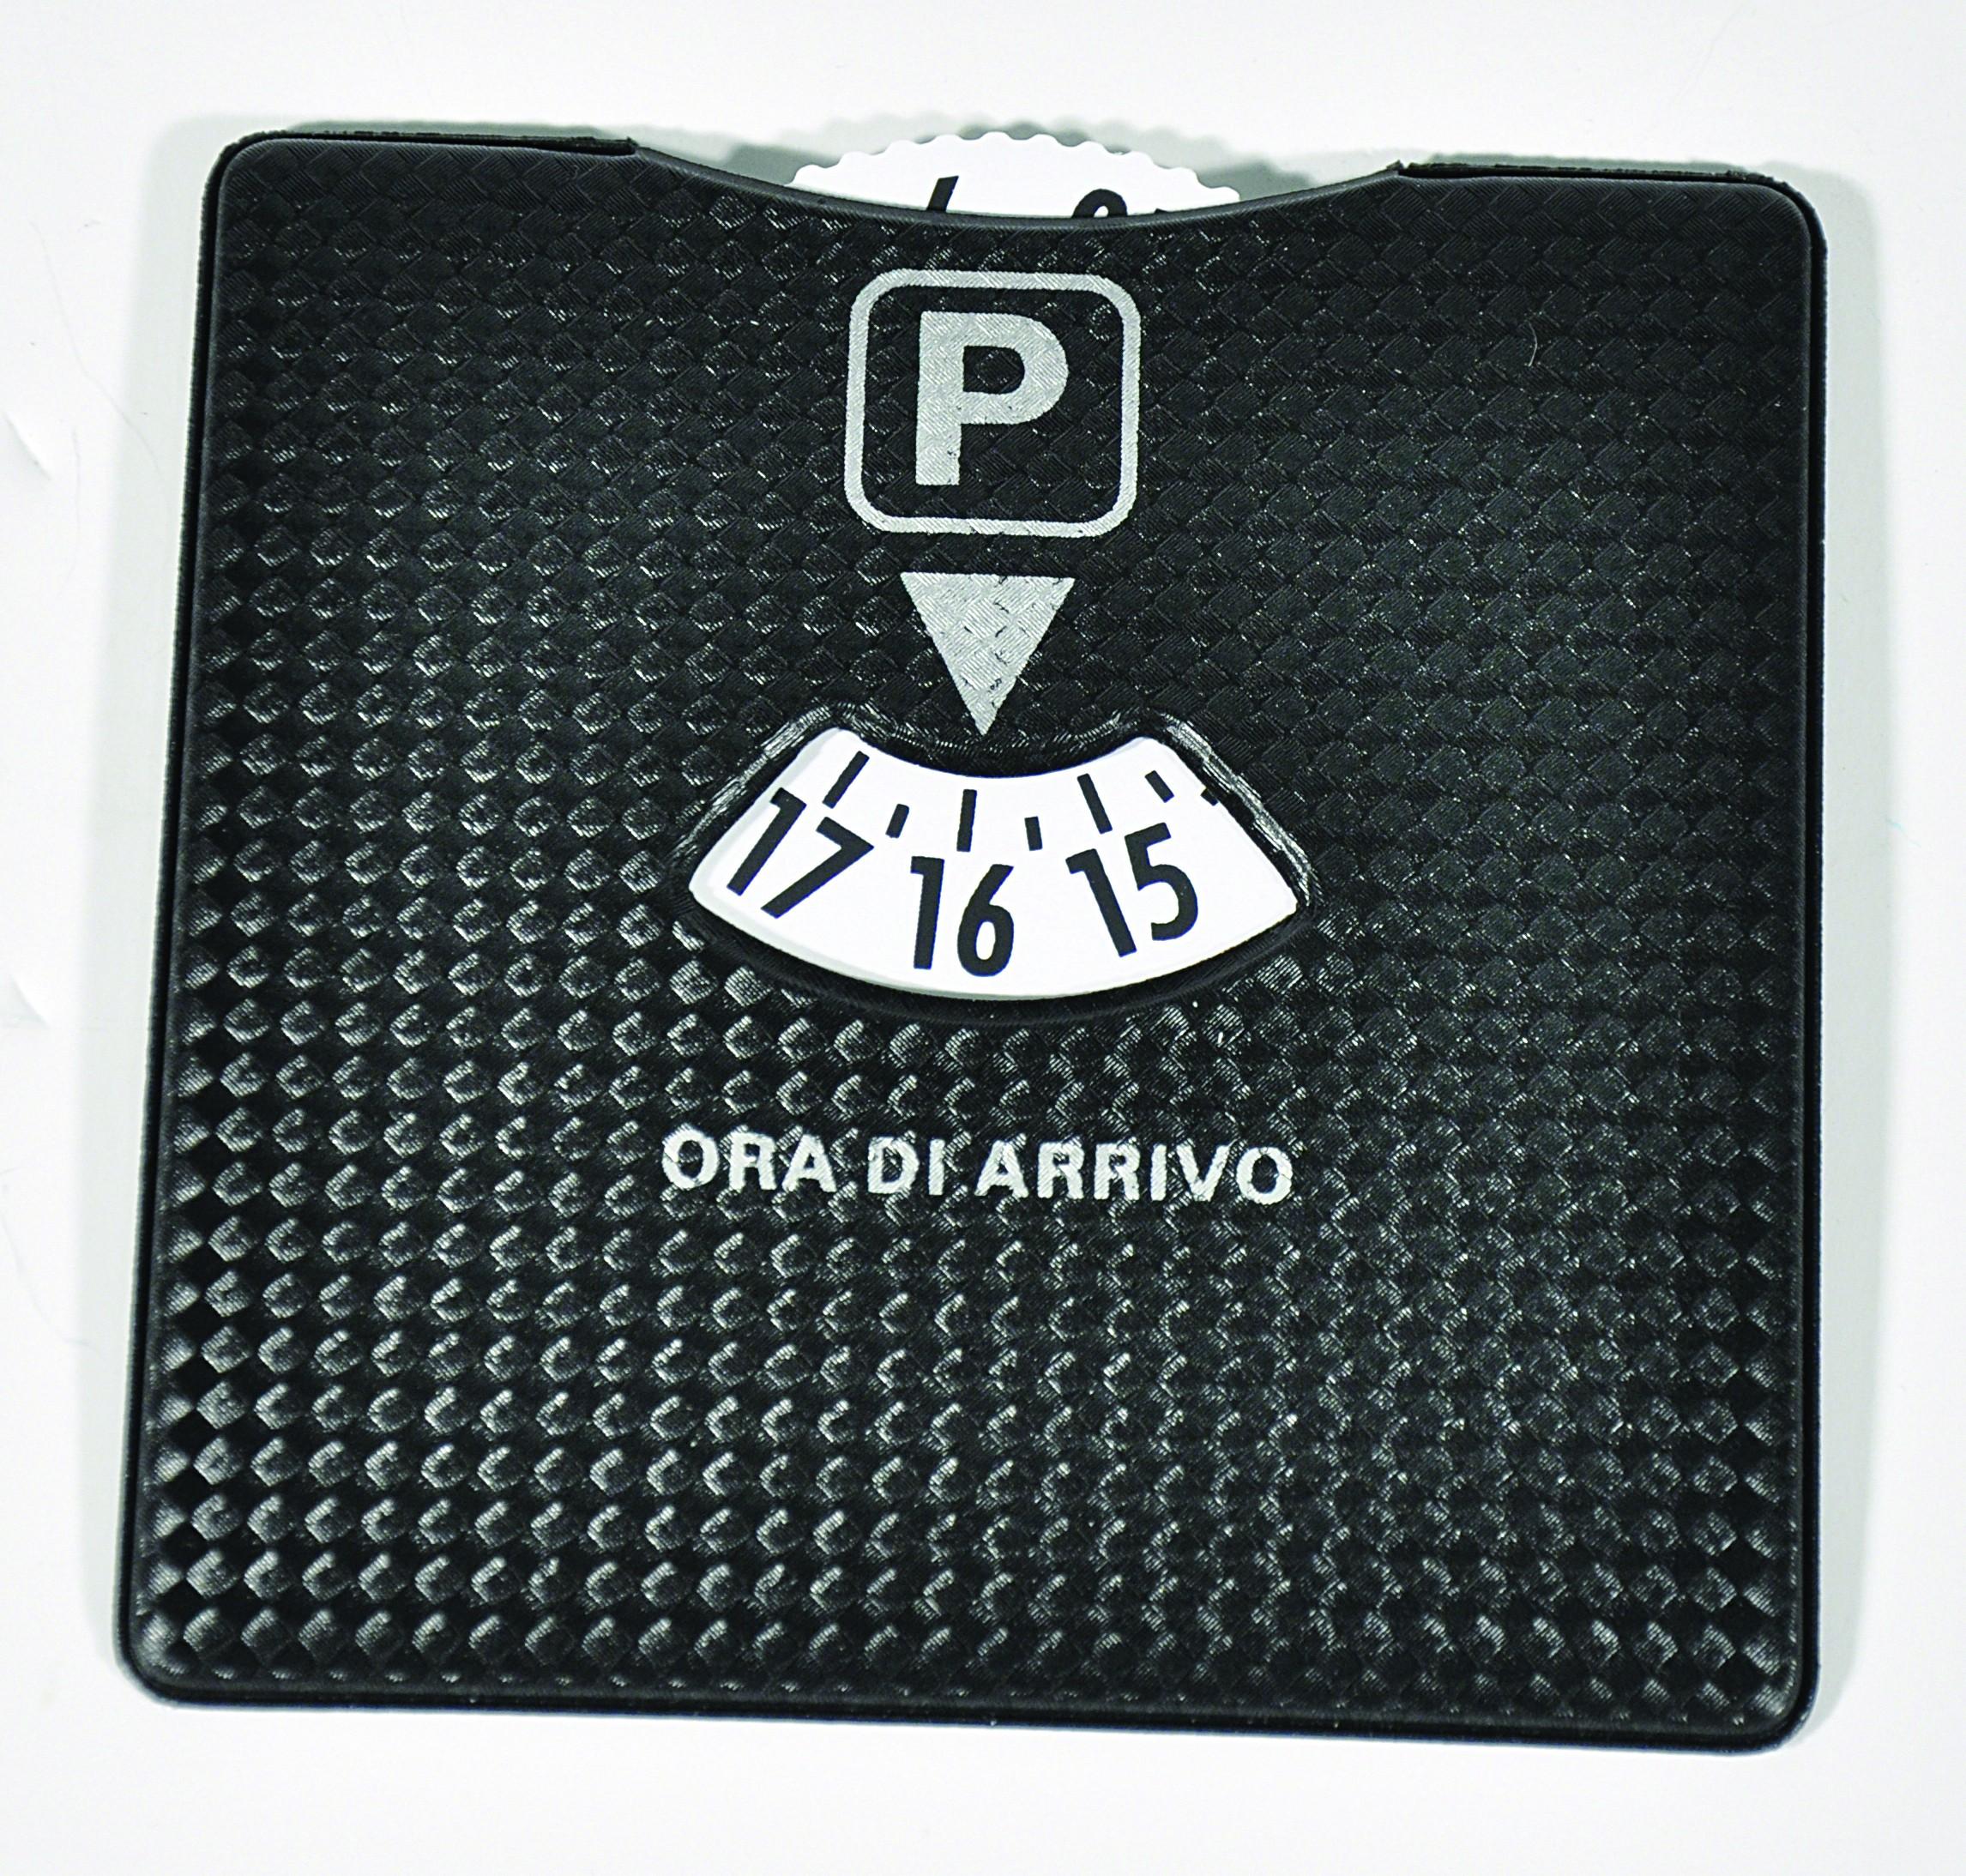 DISCO ORARIO CARBON LOOK 10x10 cm